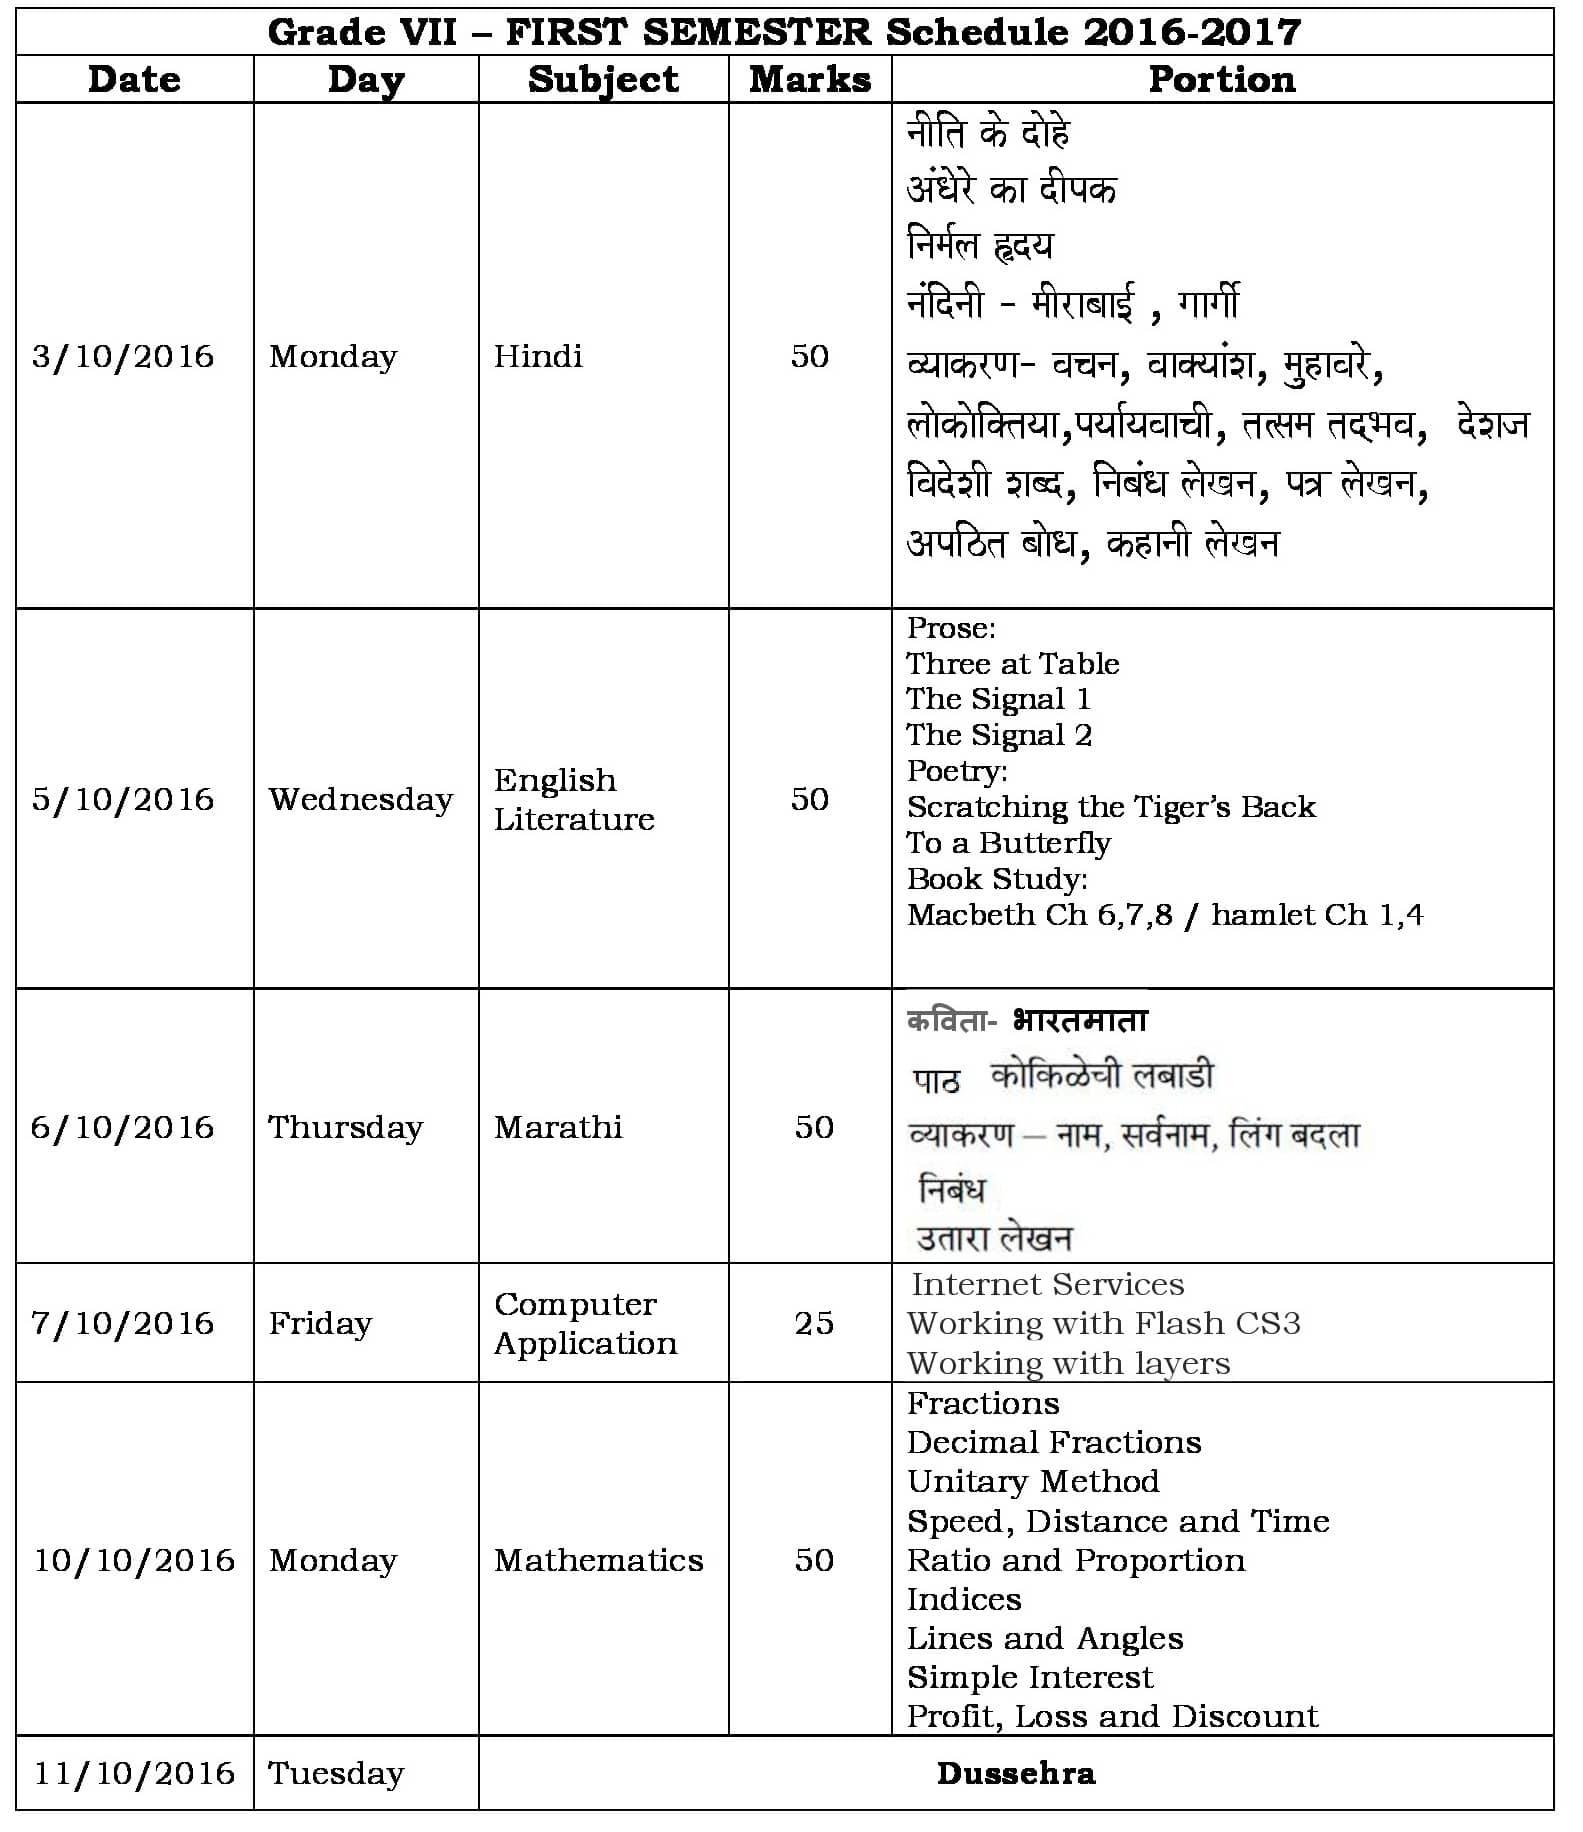 grade-vii-first-semester-exam-schedule-2016-17-0